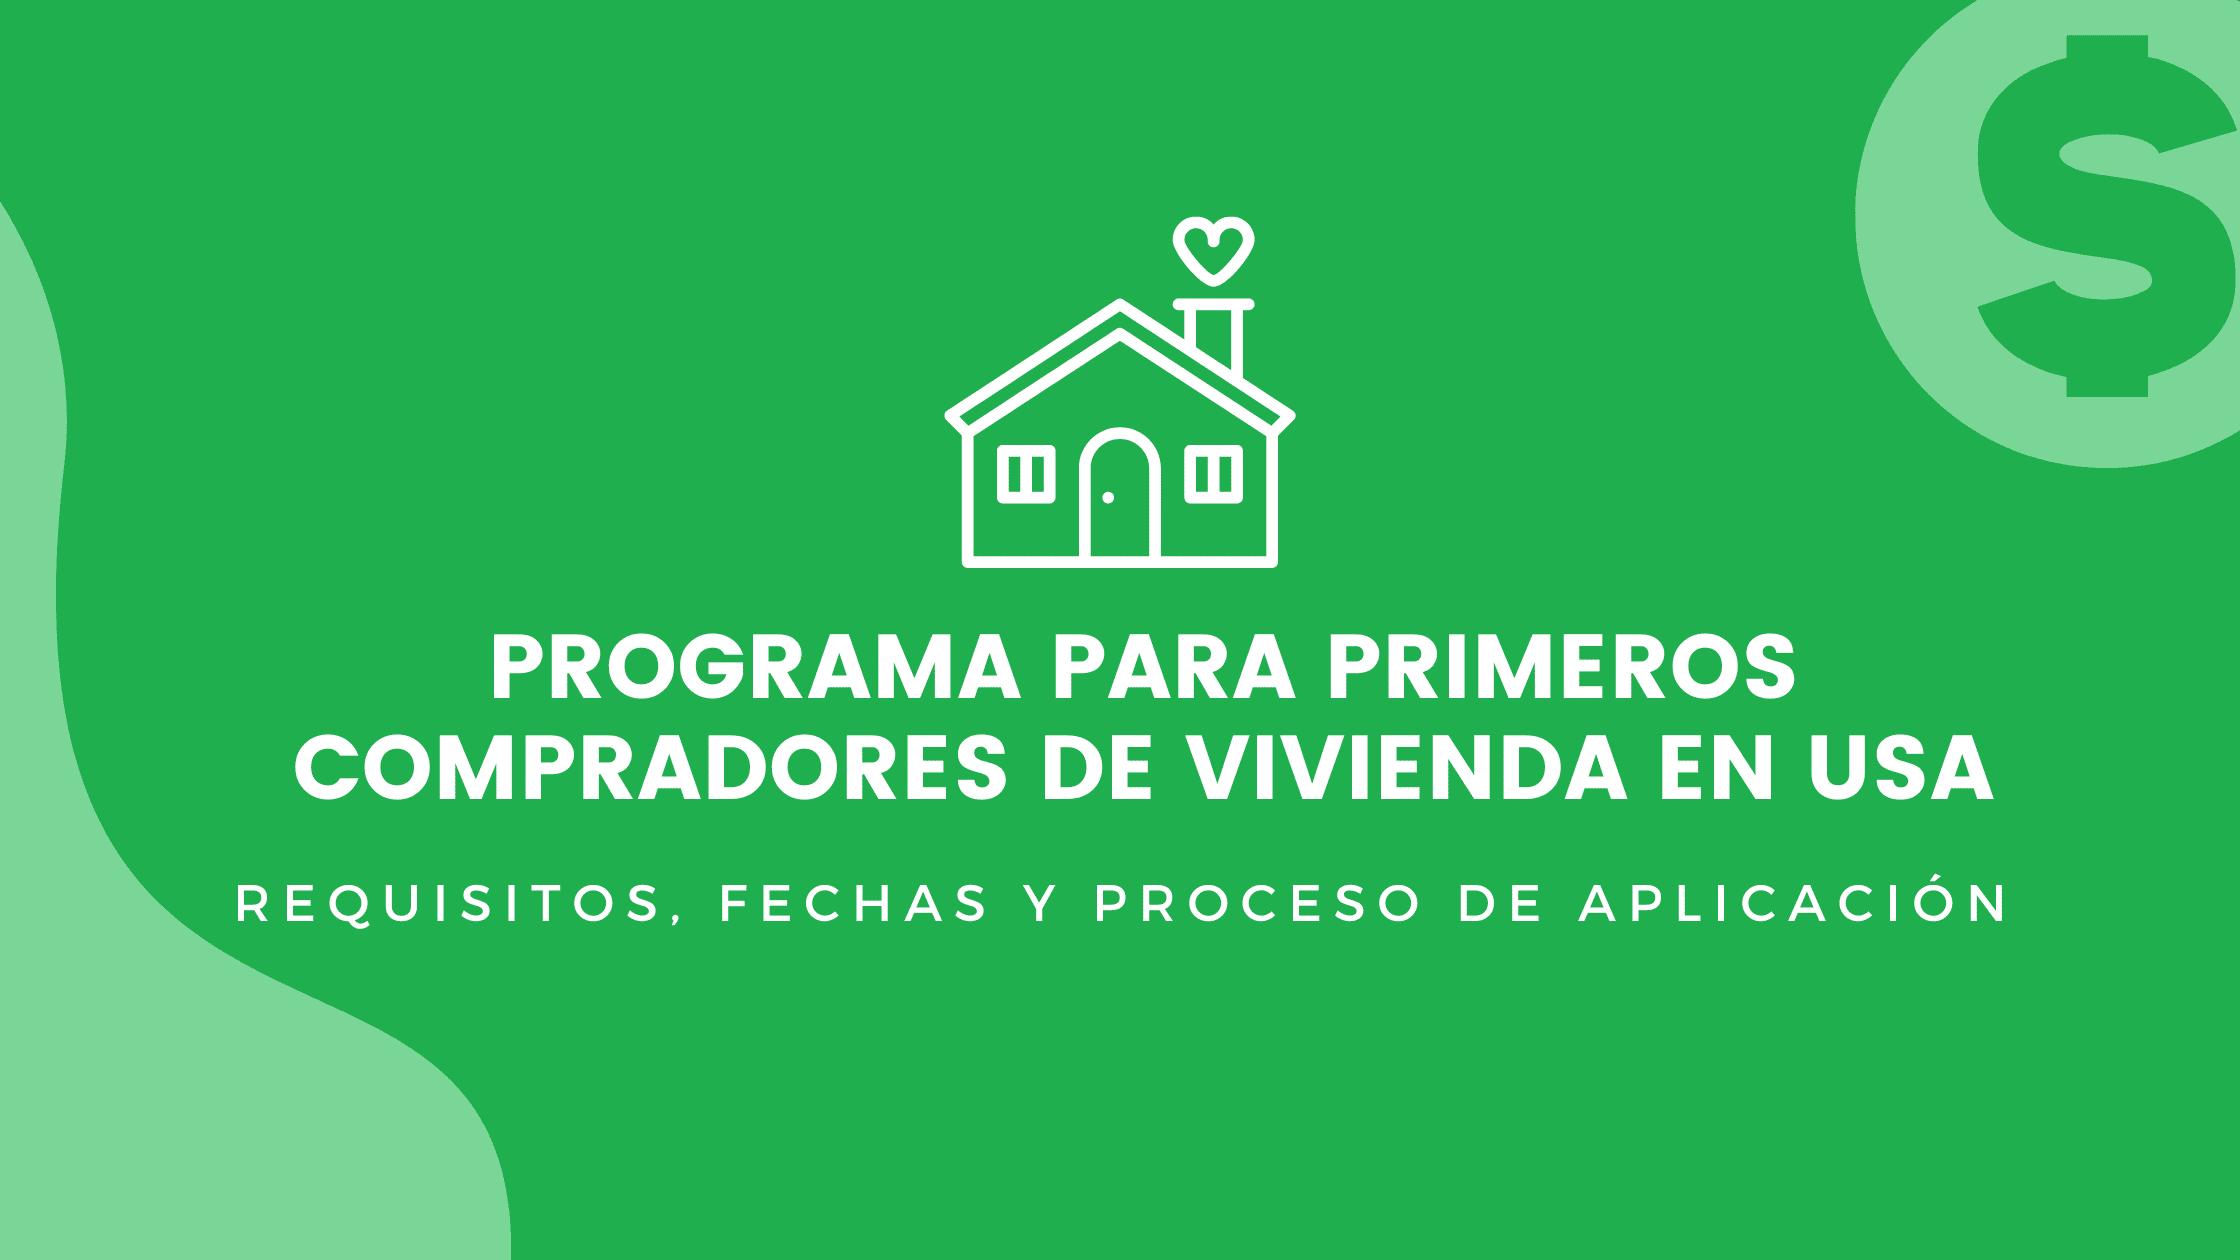 Programas para primeros compradores de casa en Estados Unidos